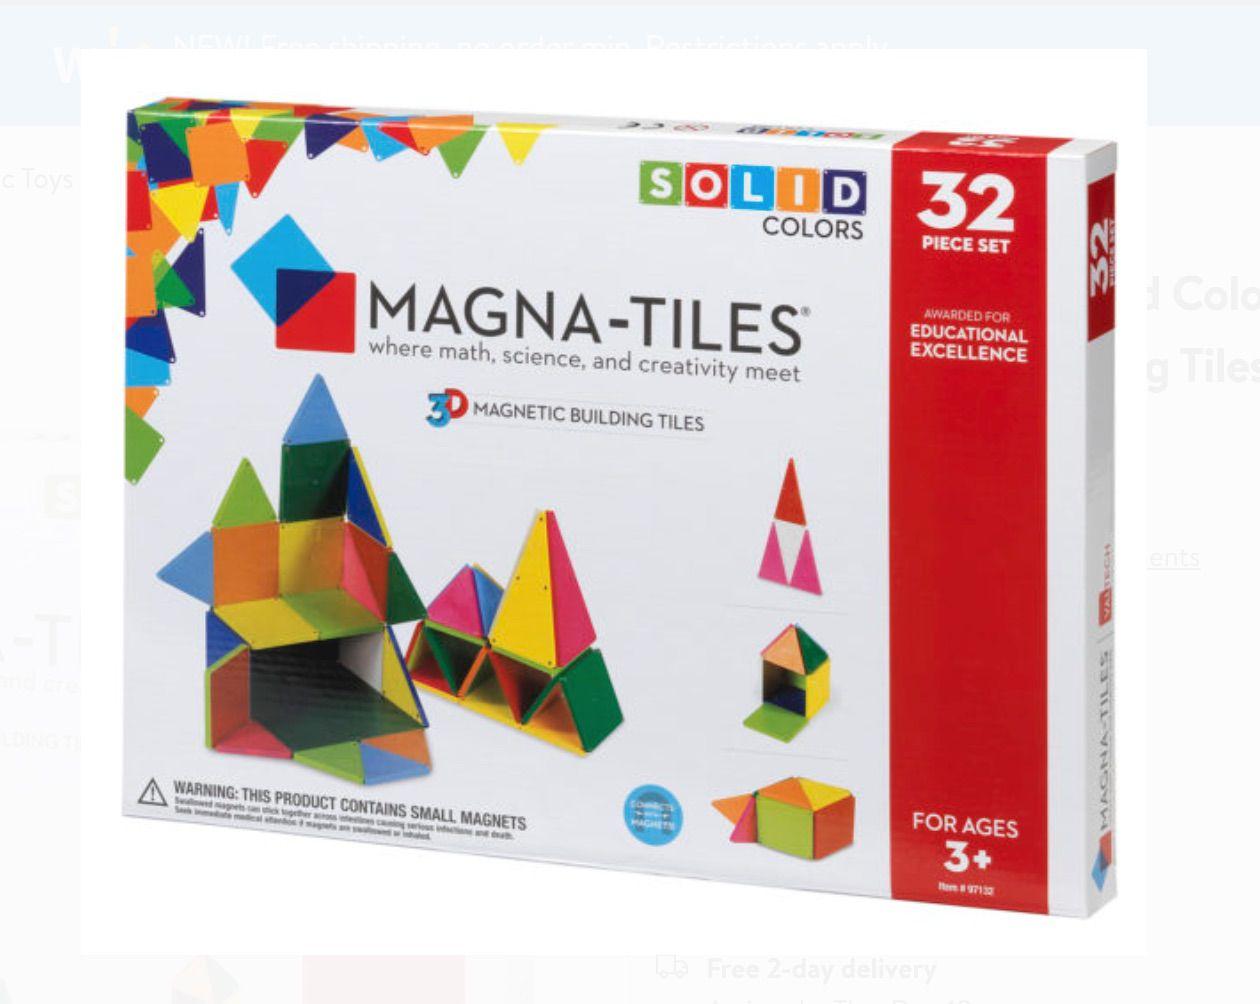 Solid Color Magna-Tiles